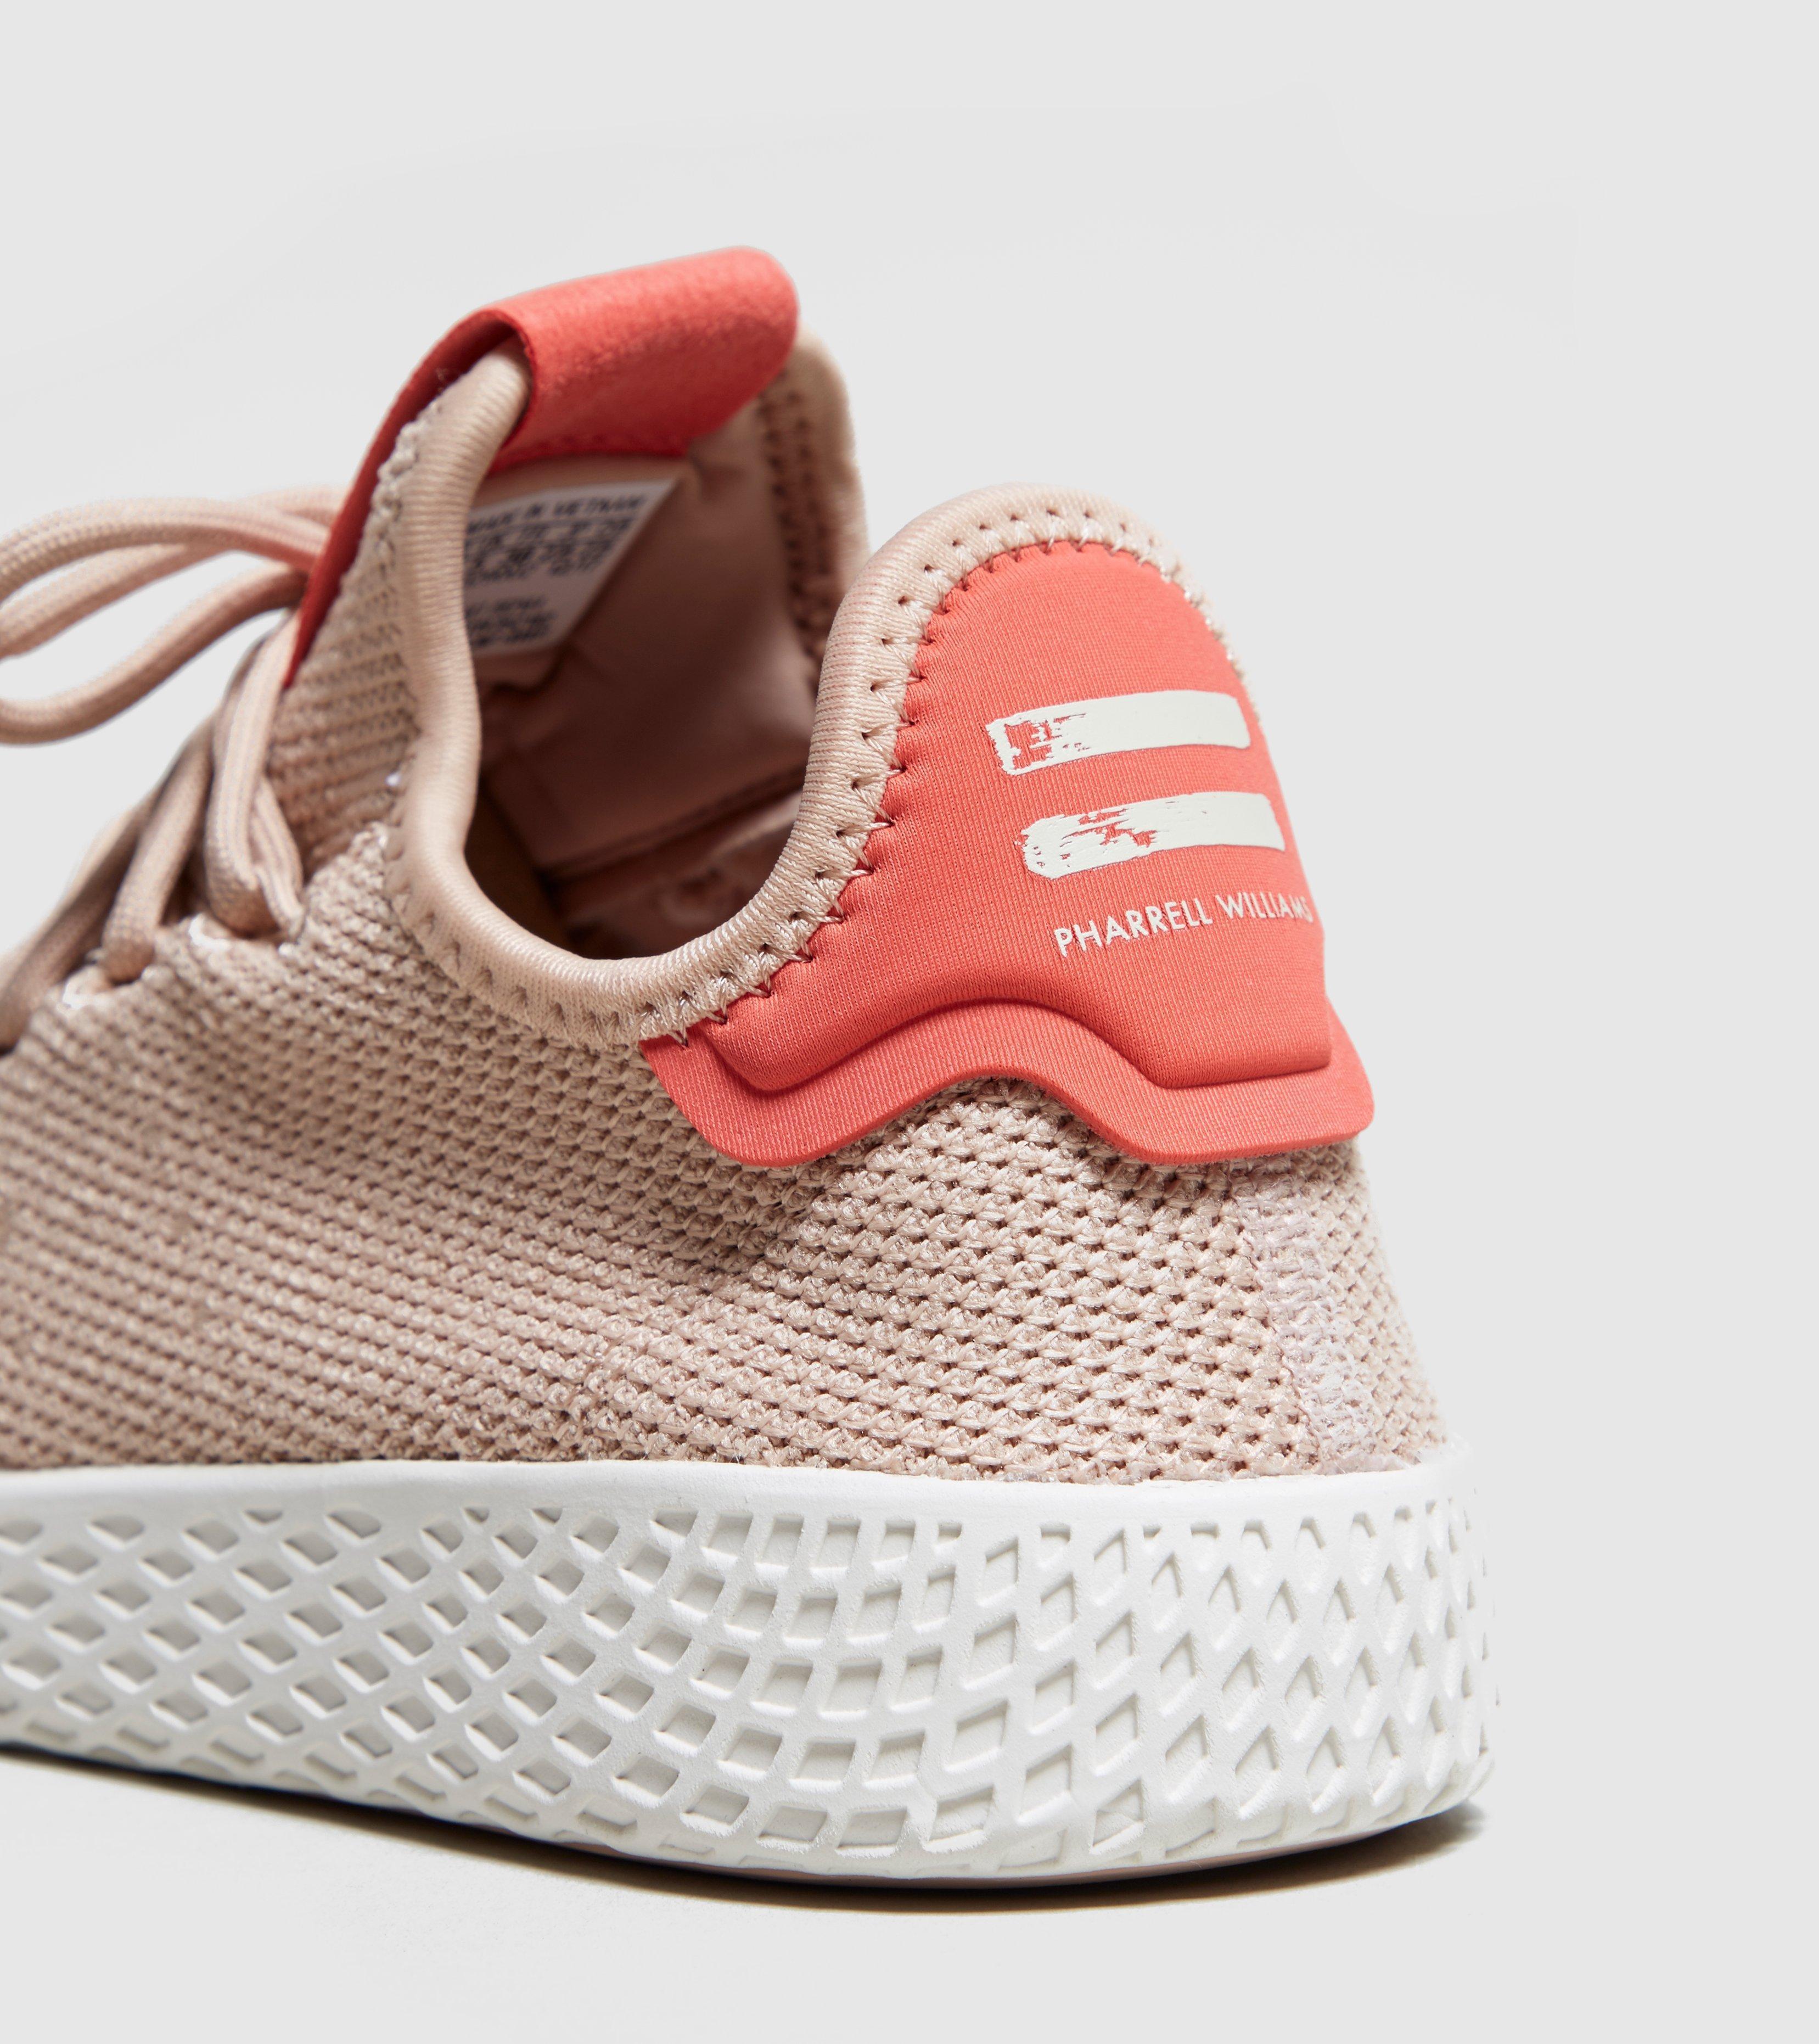 1a511f0e4 Lyst - adidas Originals X Pharrell Williams Tennis Hu Women s in Brown